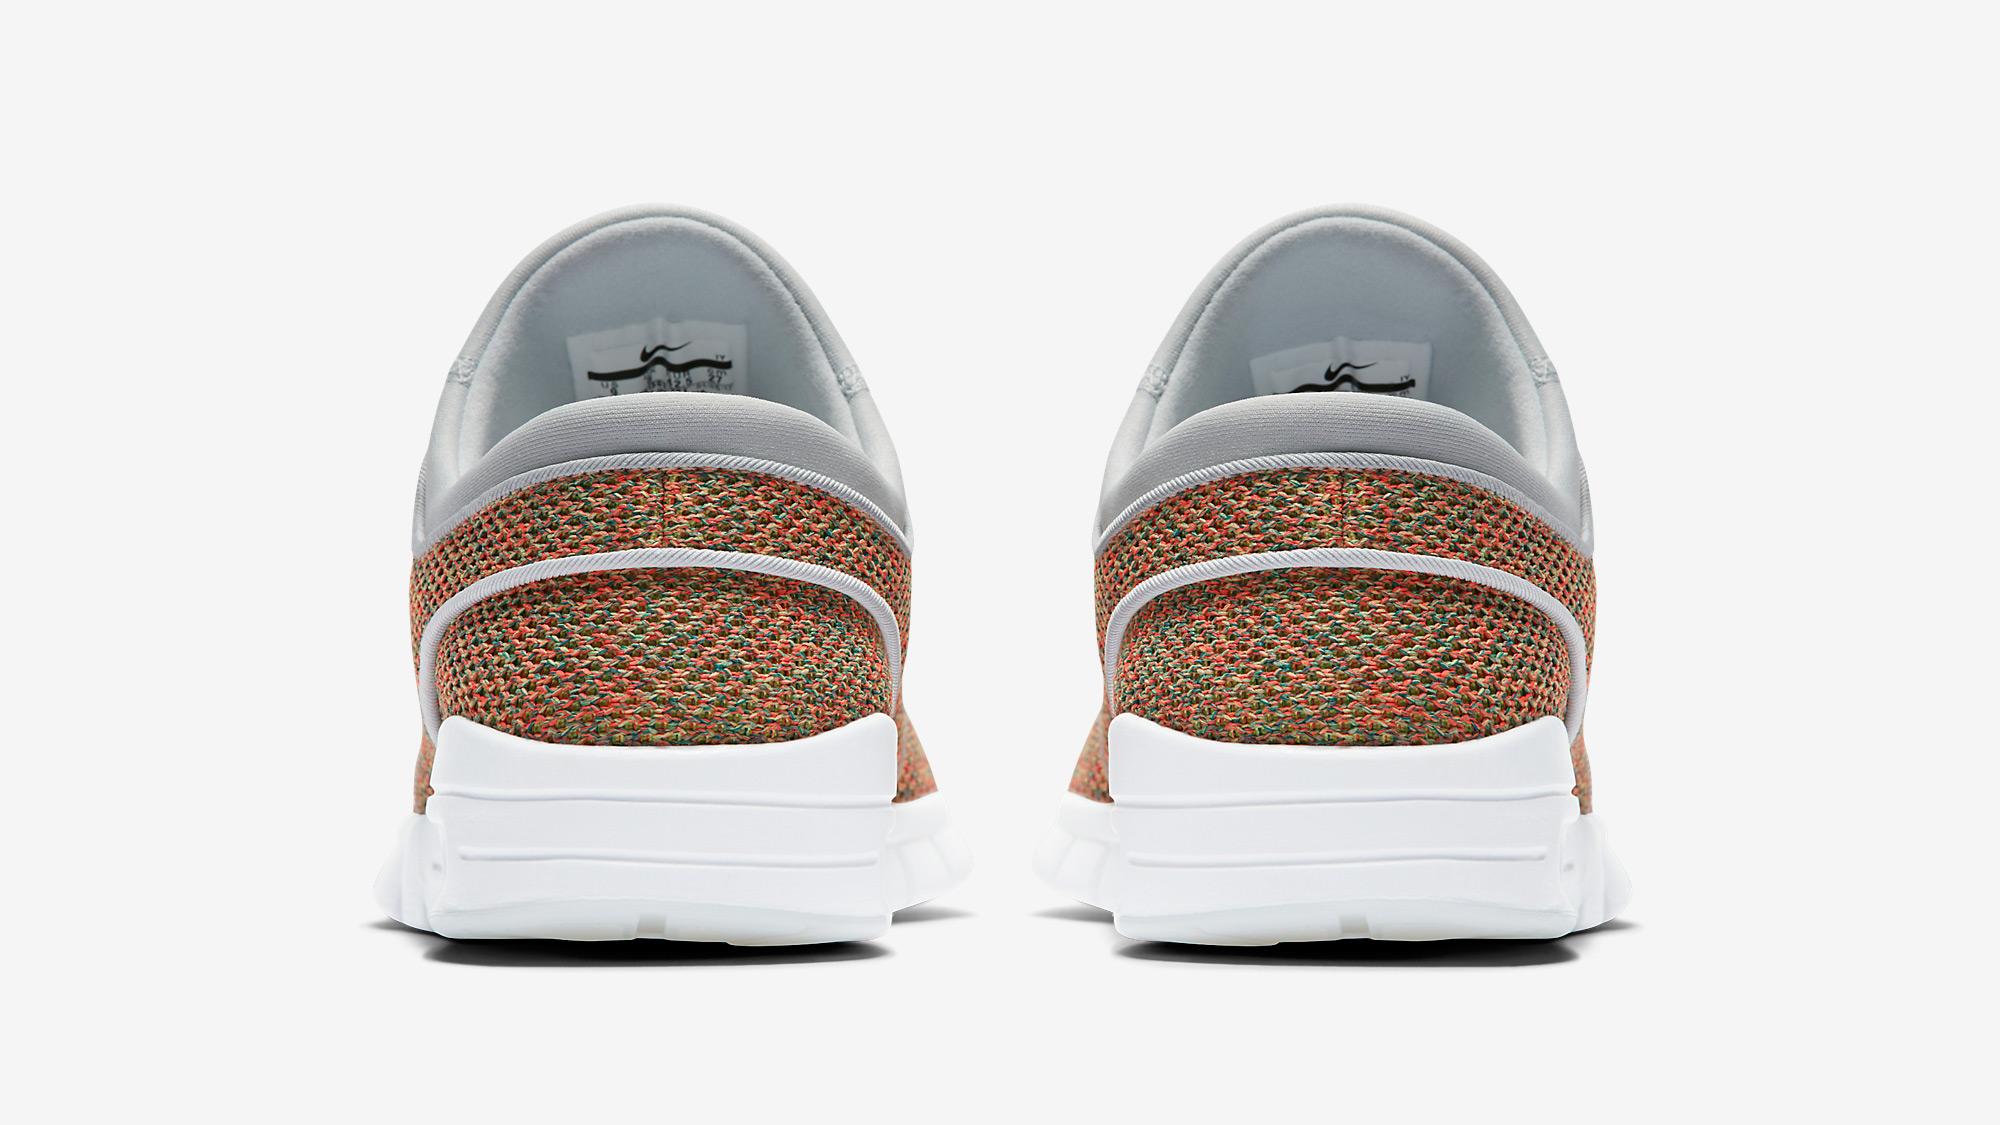 Nike SB Janoski Max Multicolor 631303-704   SneakerNews.com 4f9f9174671c